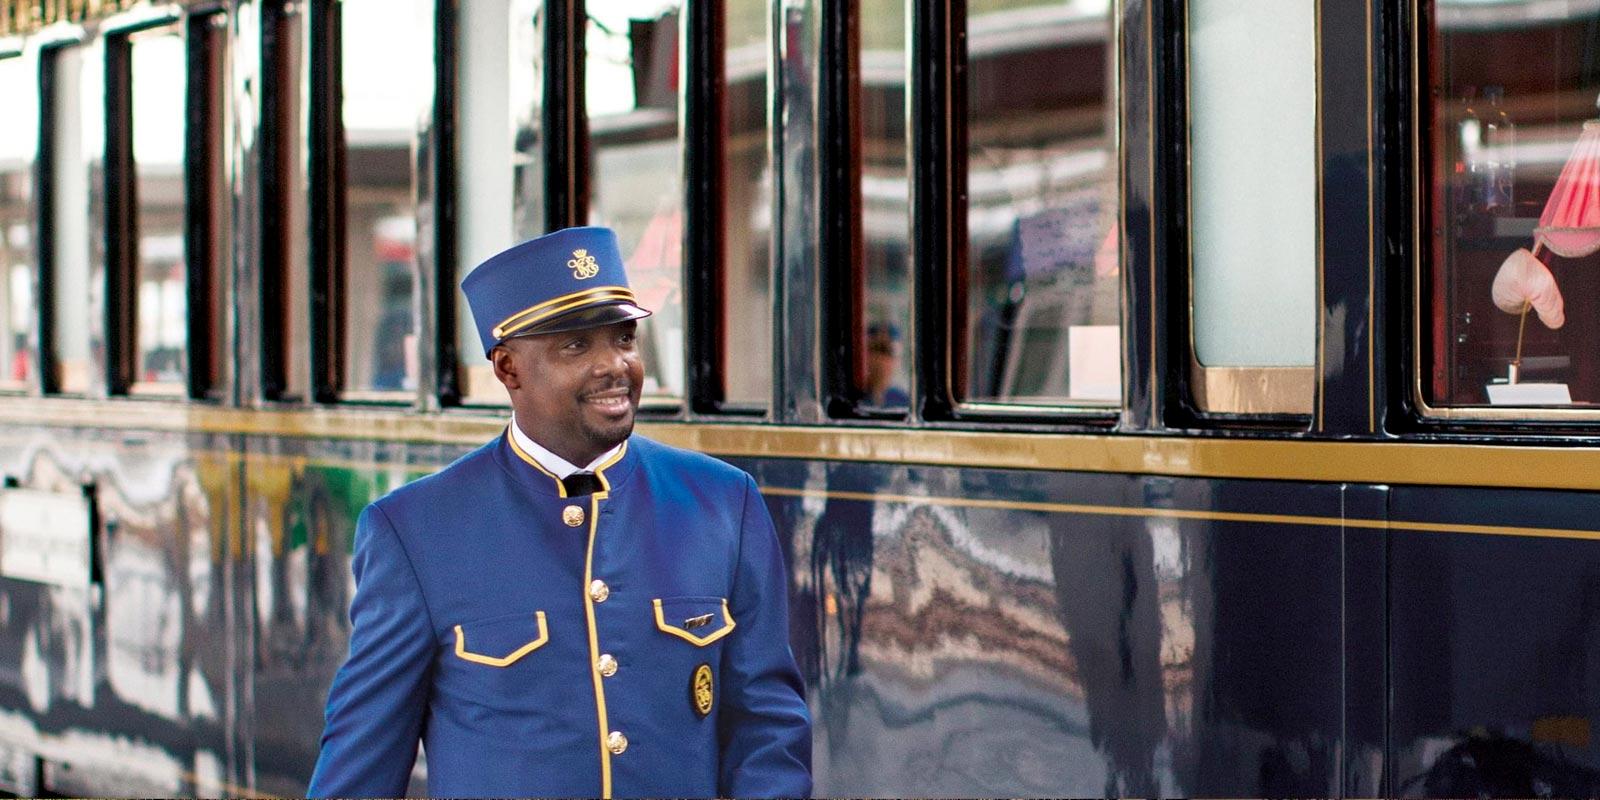 Venice Simplon-Orient-Express London to Venice Return